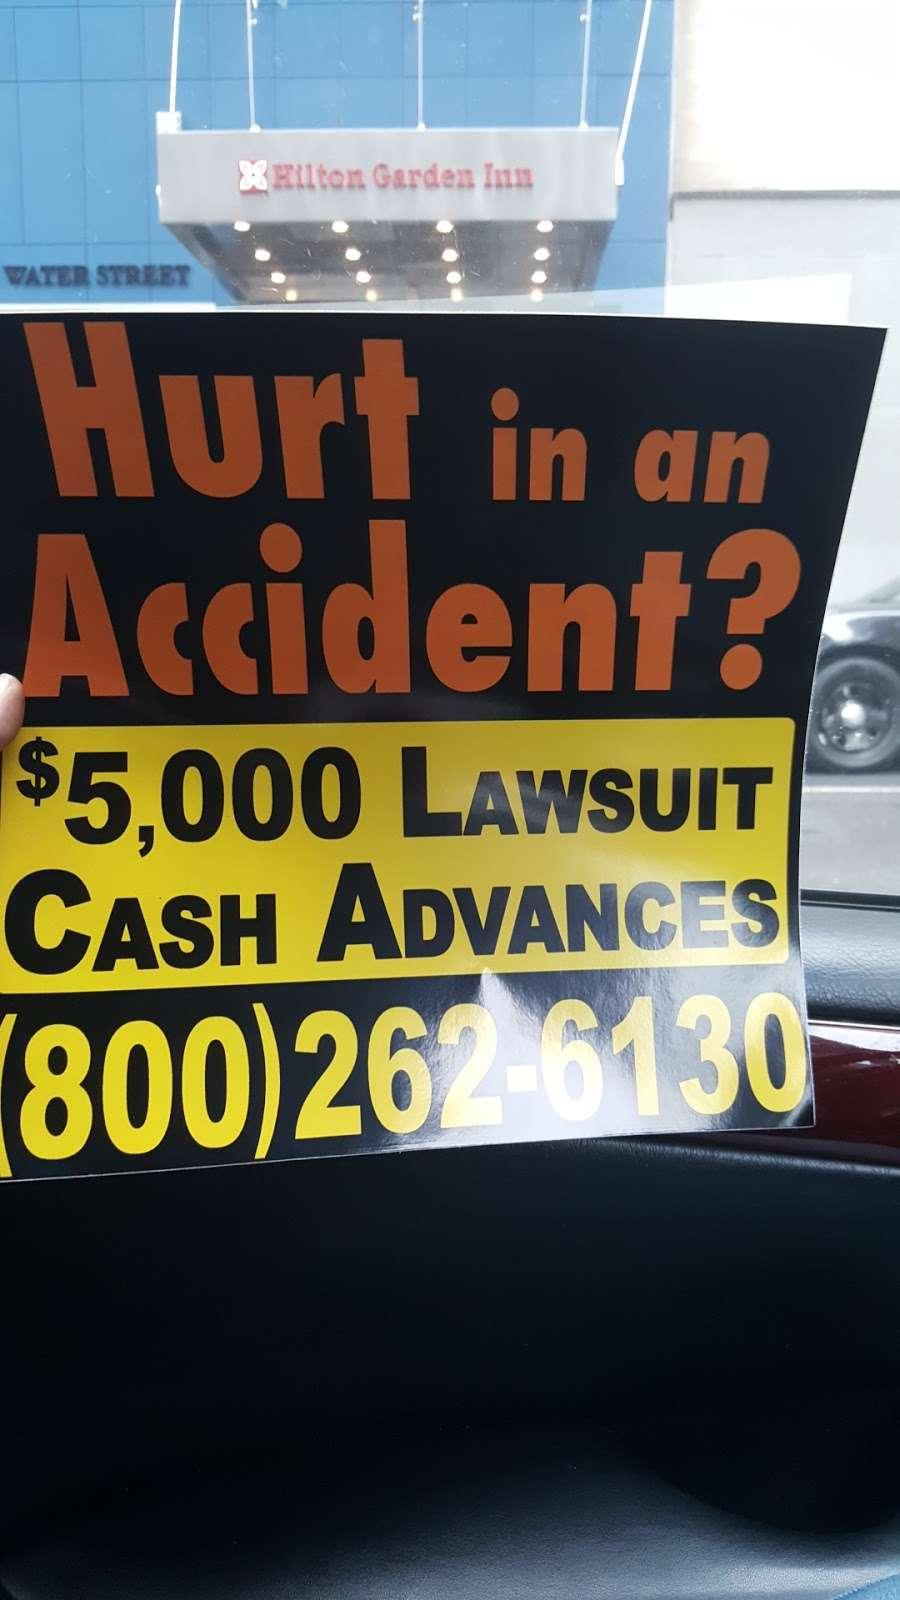 Brooklyn Chiropractic Associates Pc: Mandarino Frank J DC - health  | Photo 2 of 2 | Address: 7601 5th Ave, Brooklyn, NY 11209, USA | Phone: (718) 748-9624